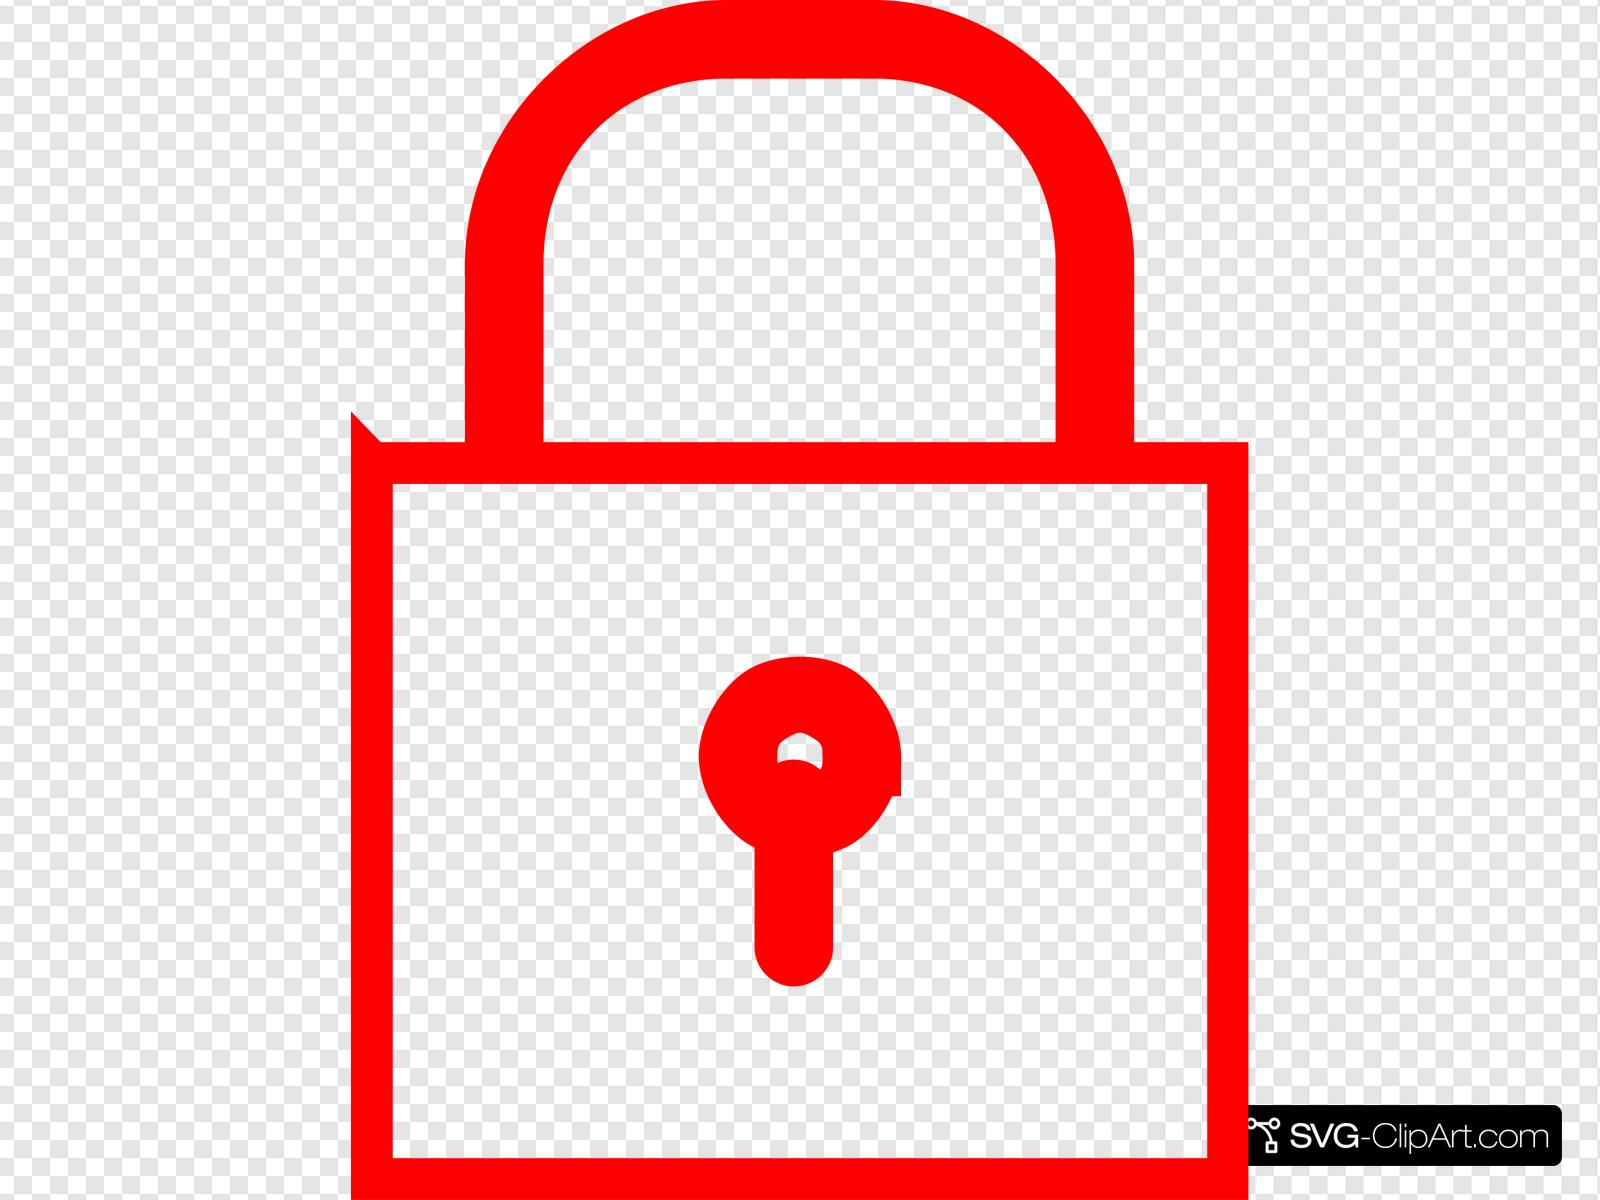 Iea clipart clip freeuse stock Lock Clip art, Icon and SVG - SVG Clipart clip freeuse stock